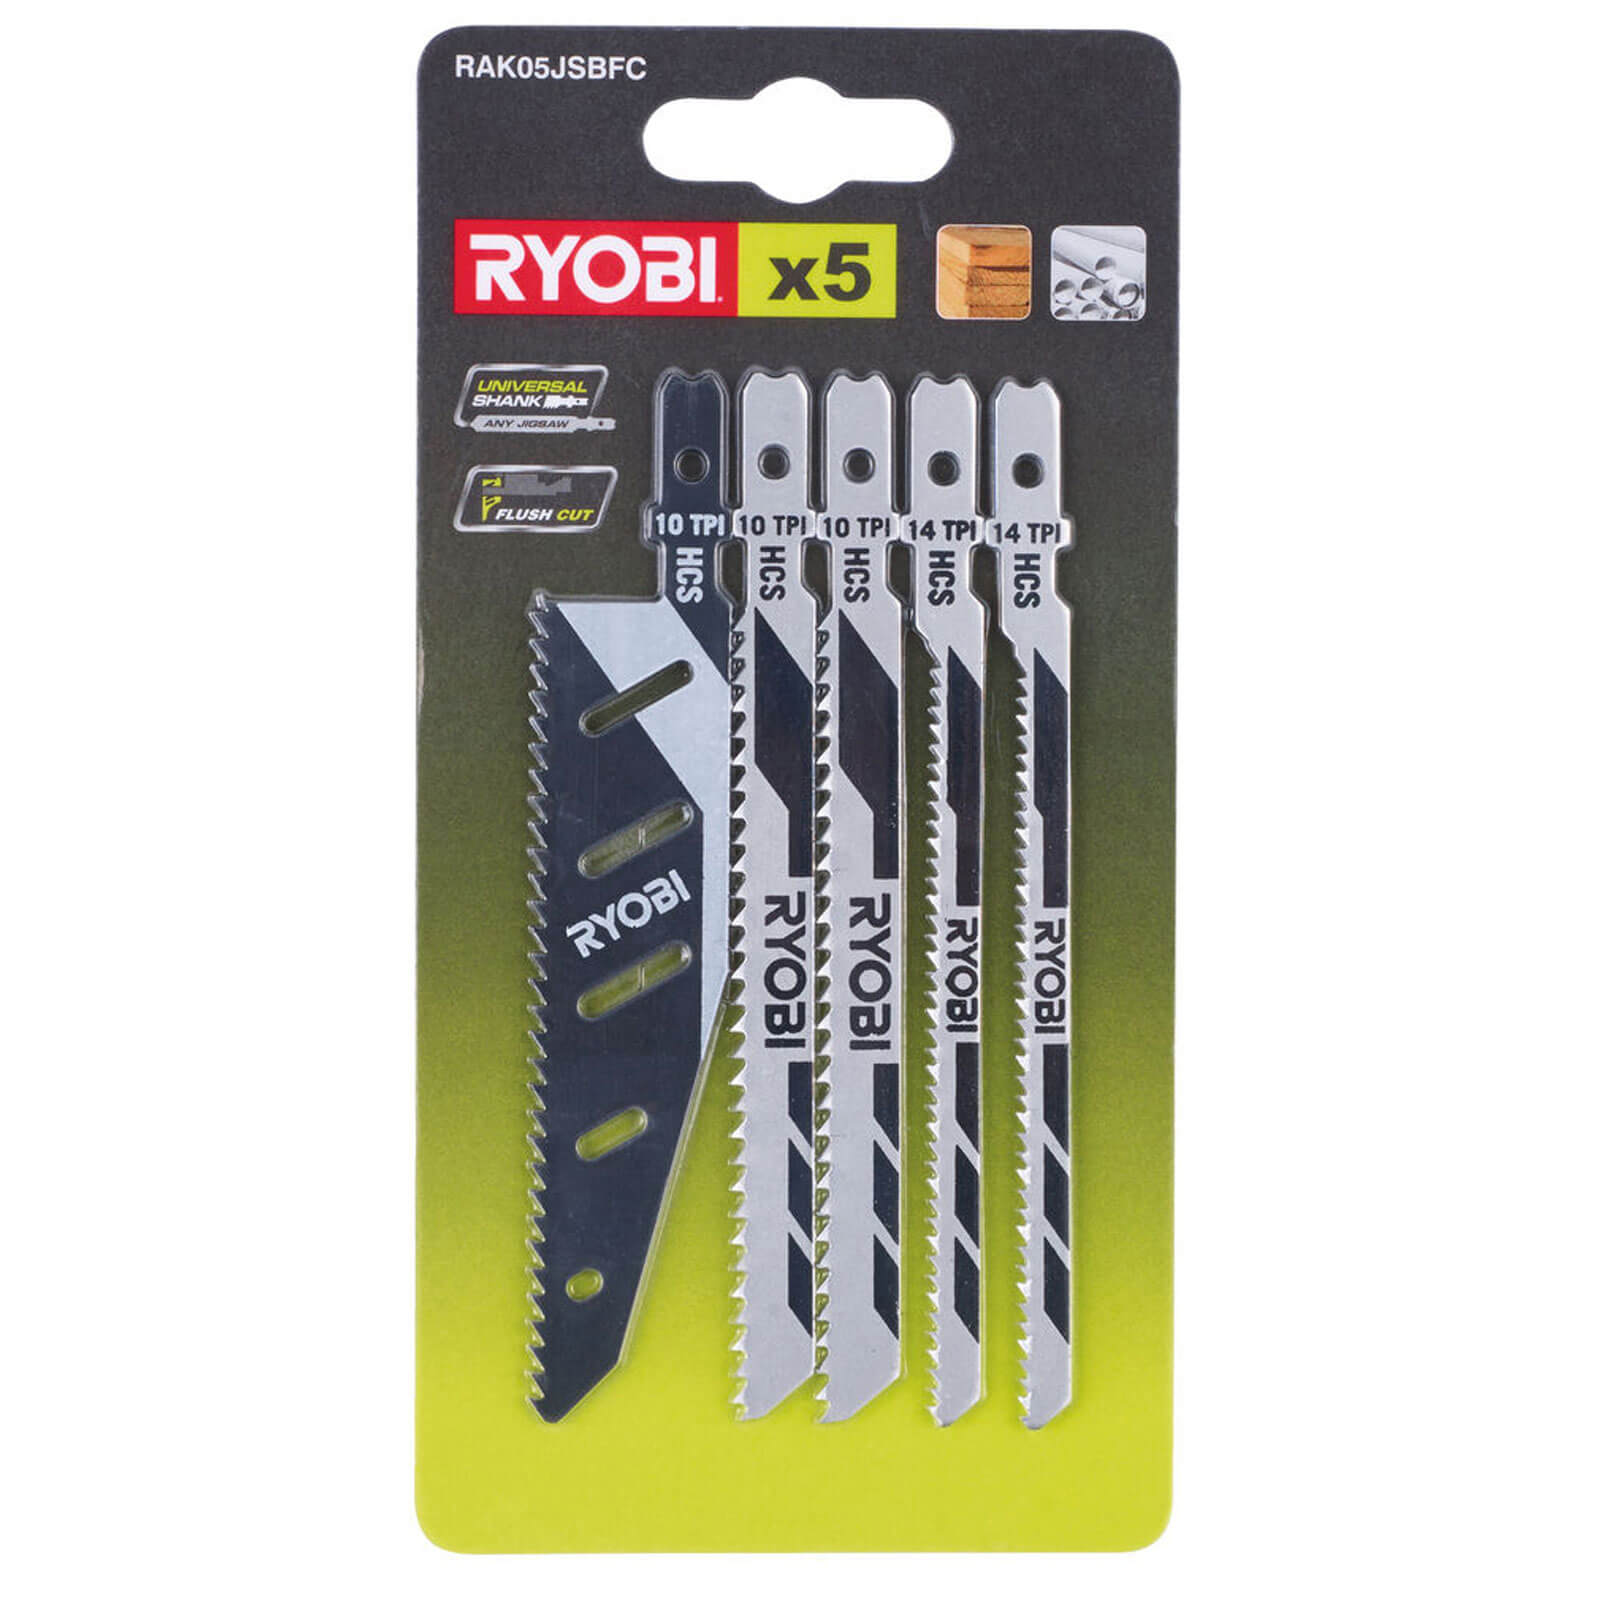 Ryobi 5 Piece Universal Jigsaw Blade Set